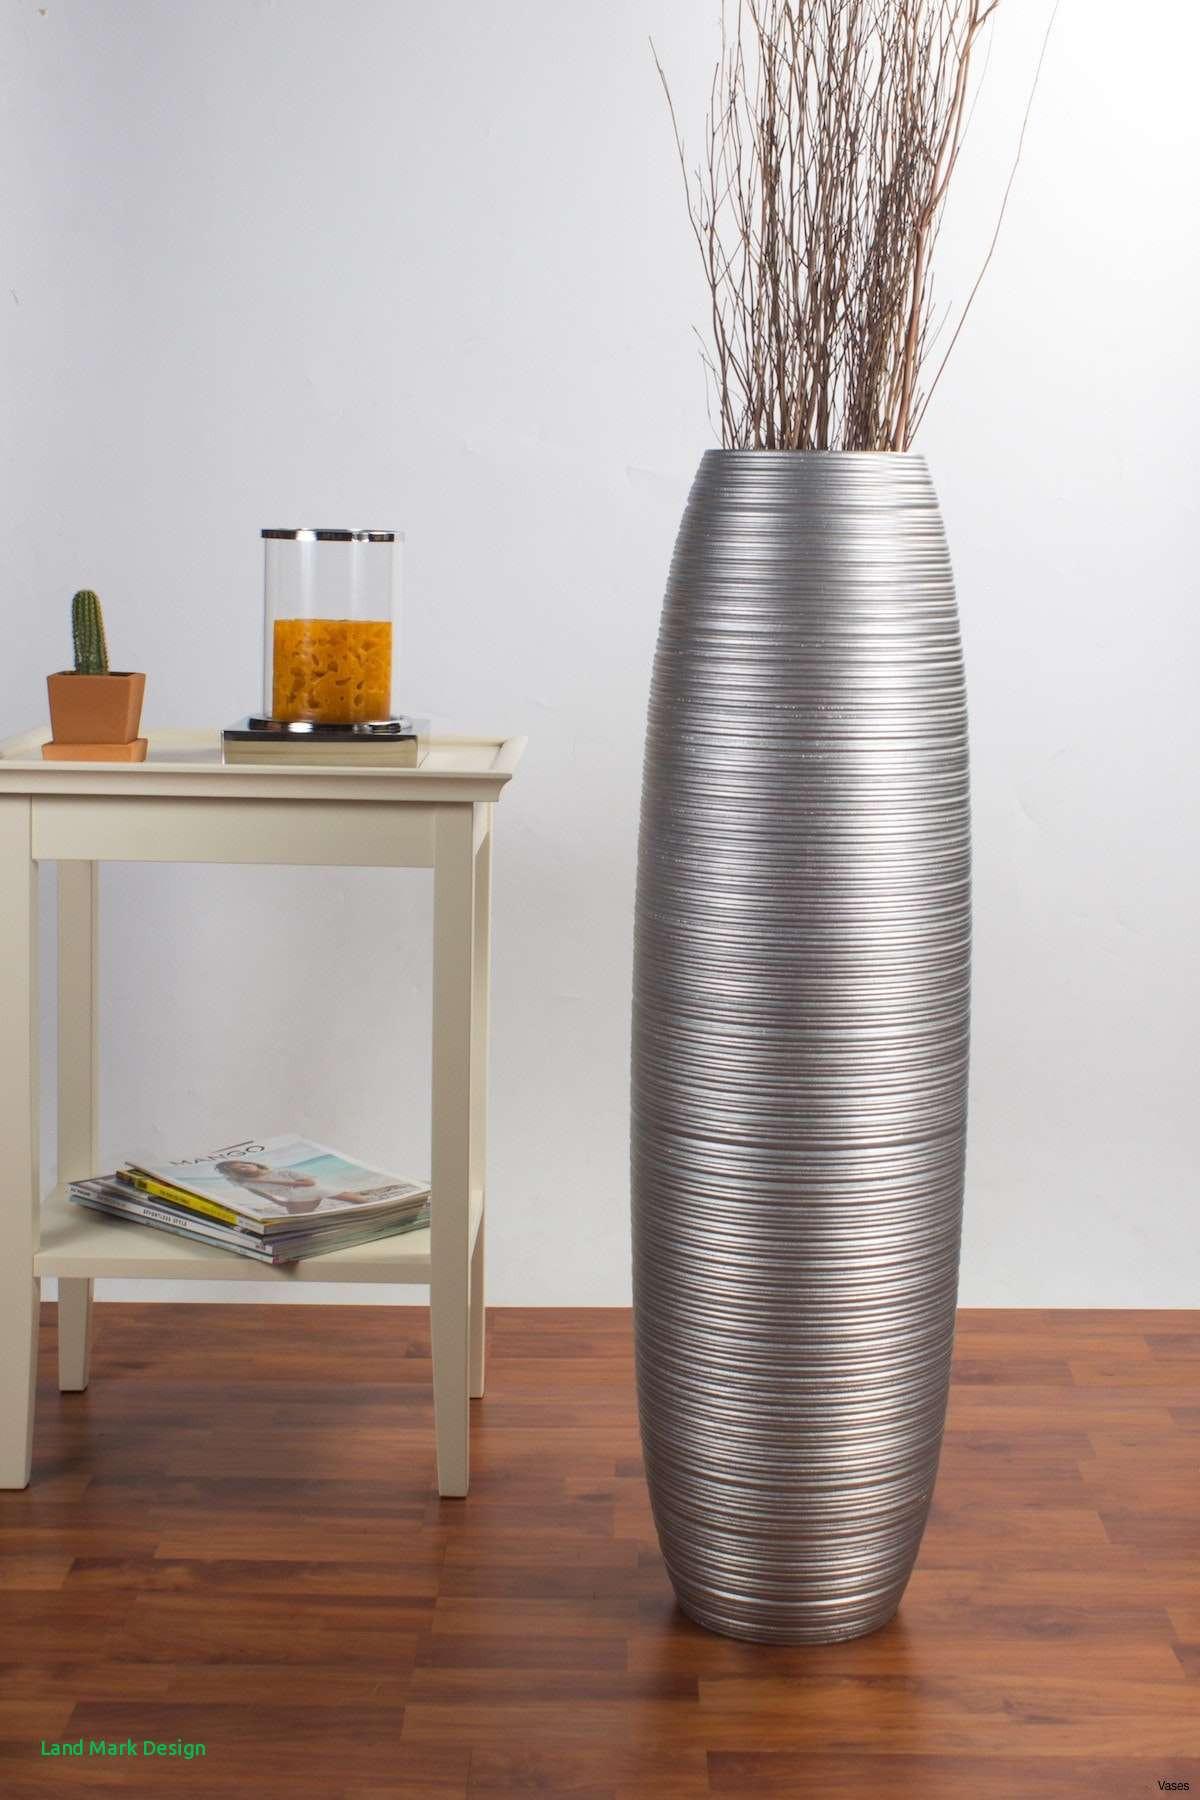 18 attractive Metal Bud Vase 2021 free download metal bud vase of 20 unique very tall decorative vases bogekompresorturkiye com with img 5175h vases floor tall vase 36 inches wood silveri 0d